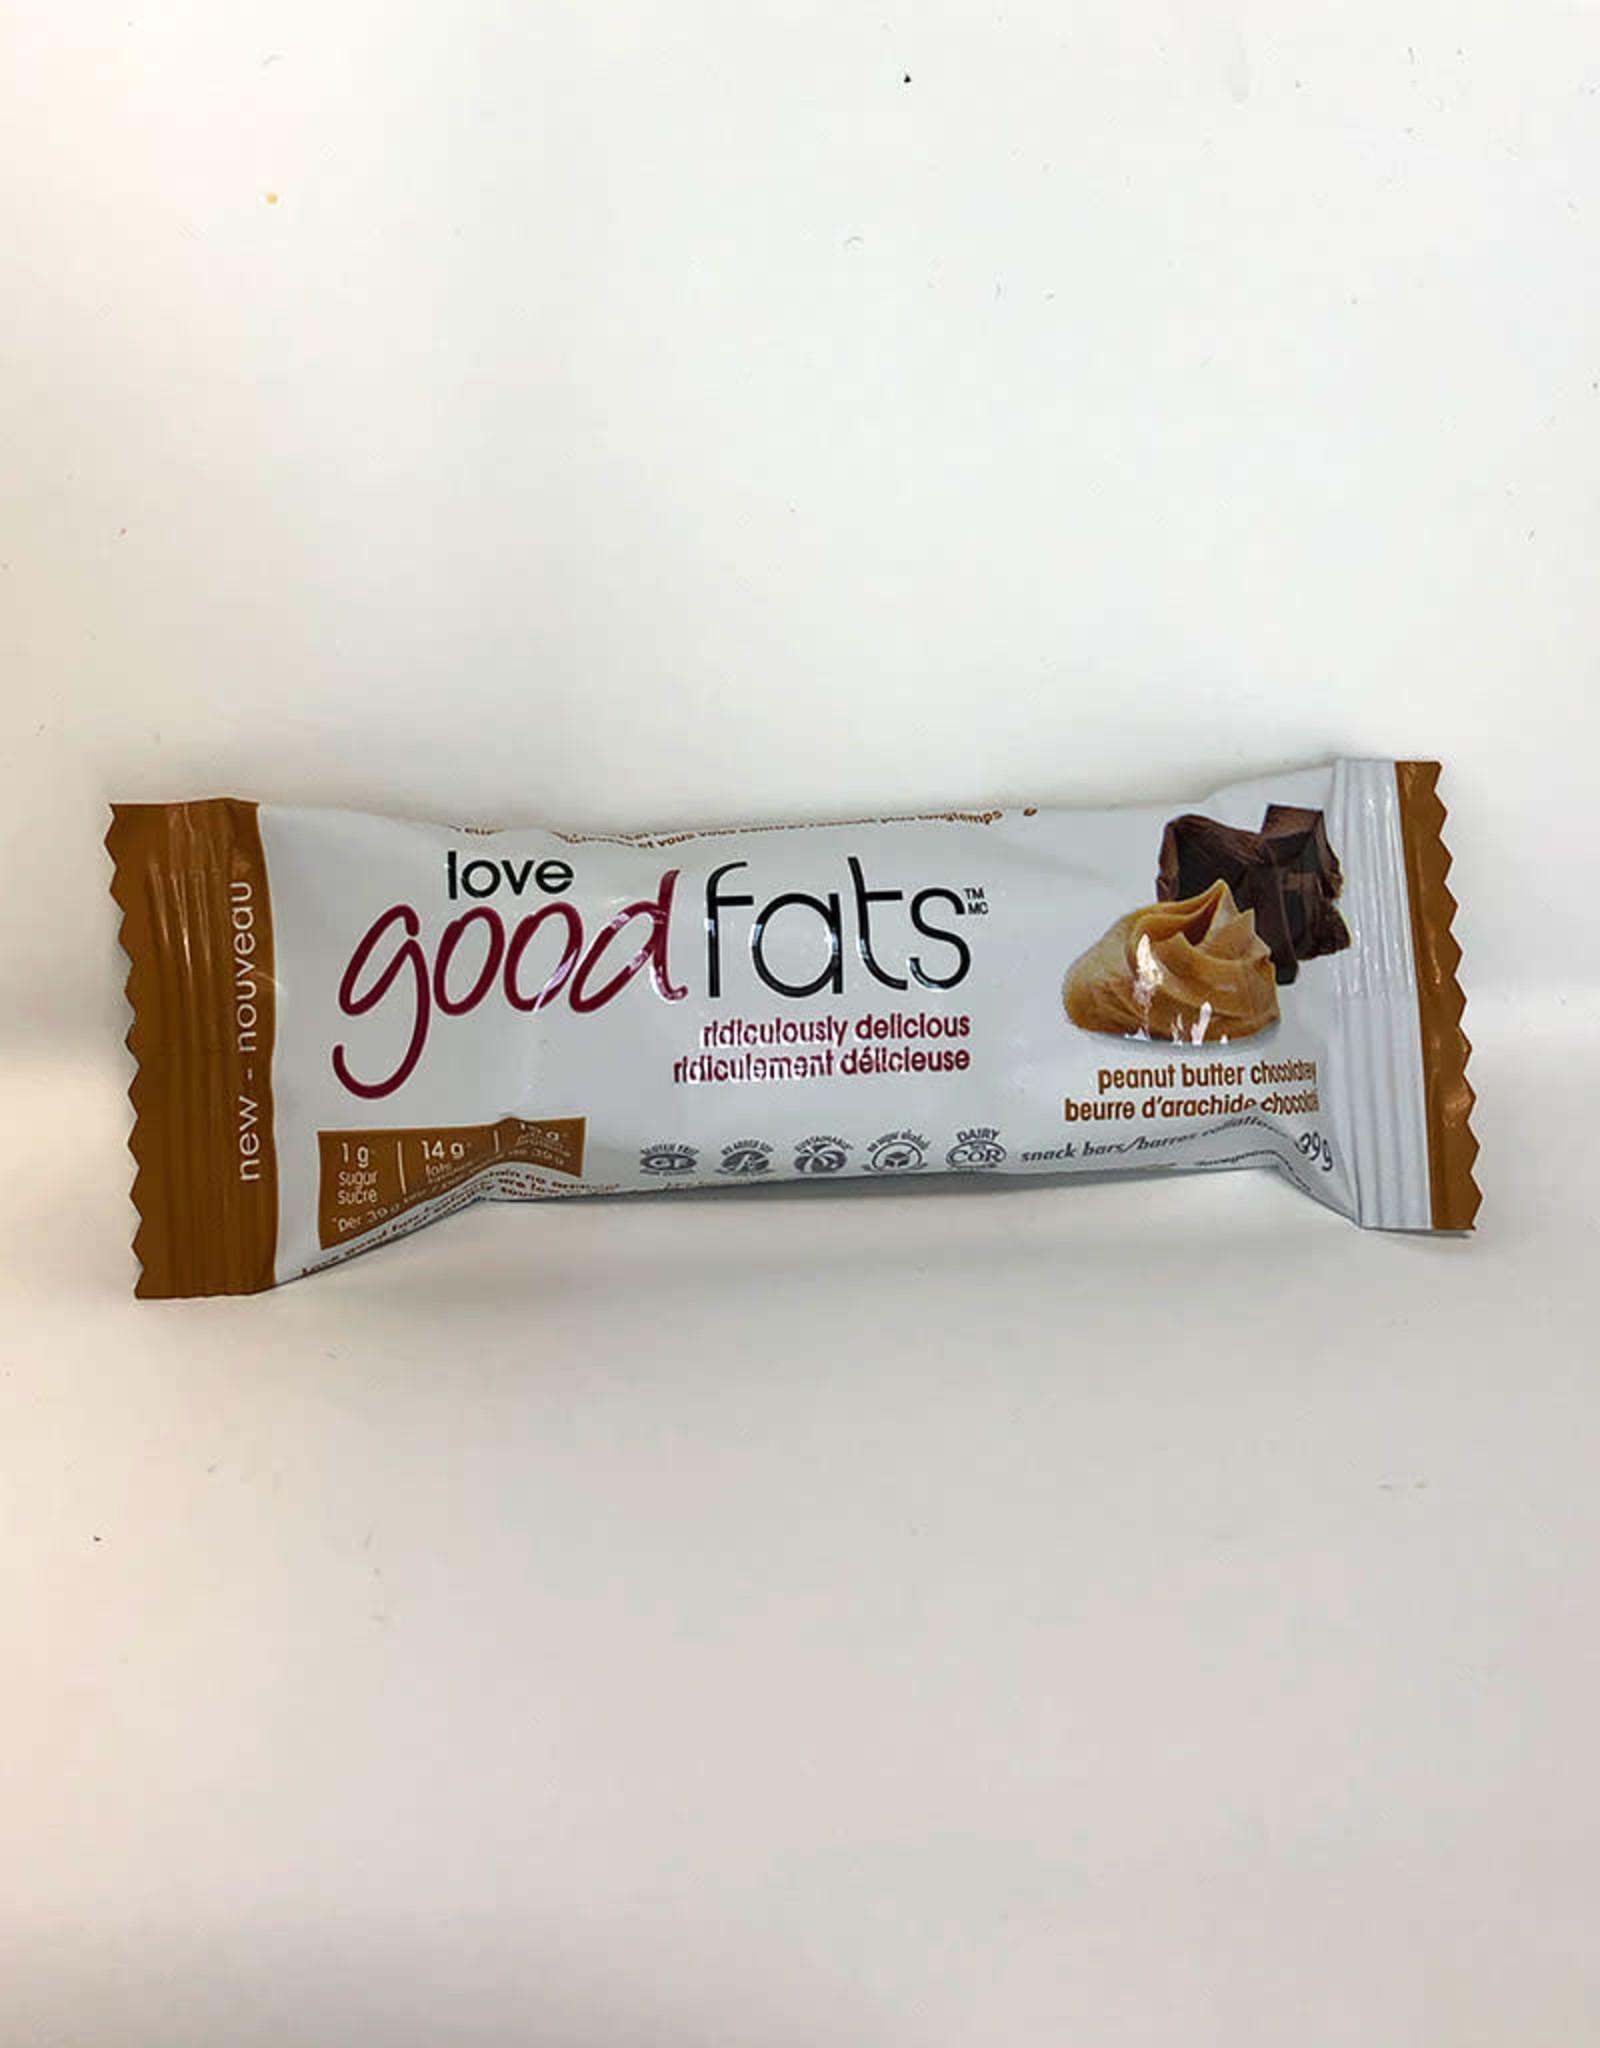 Love Good Fats Love Good Fats - Peanut Butter Chocolatey